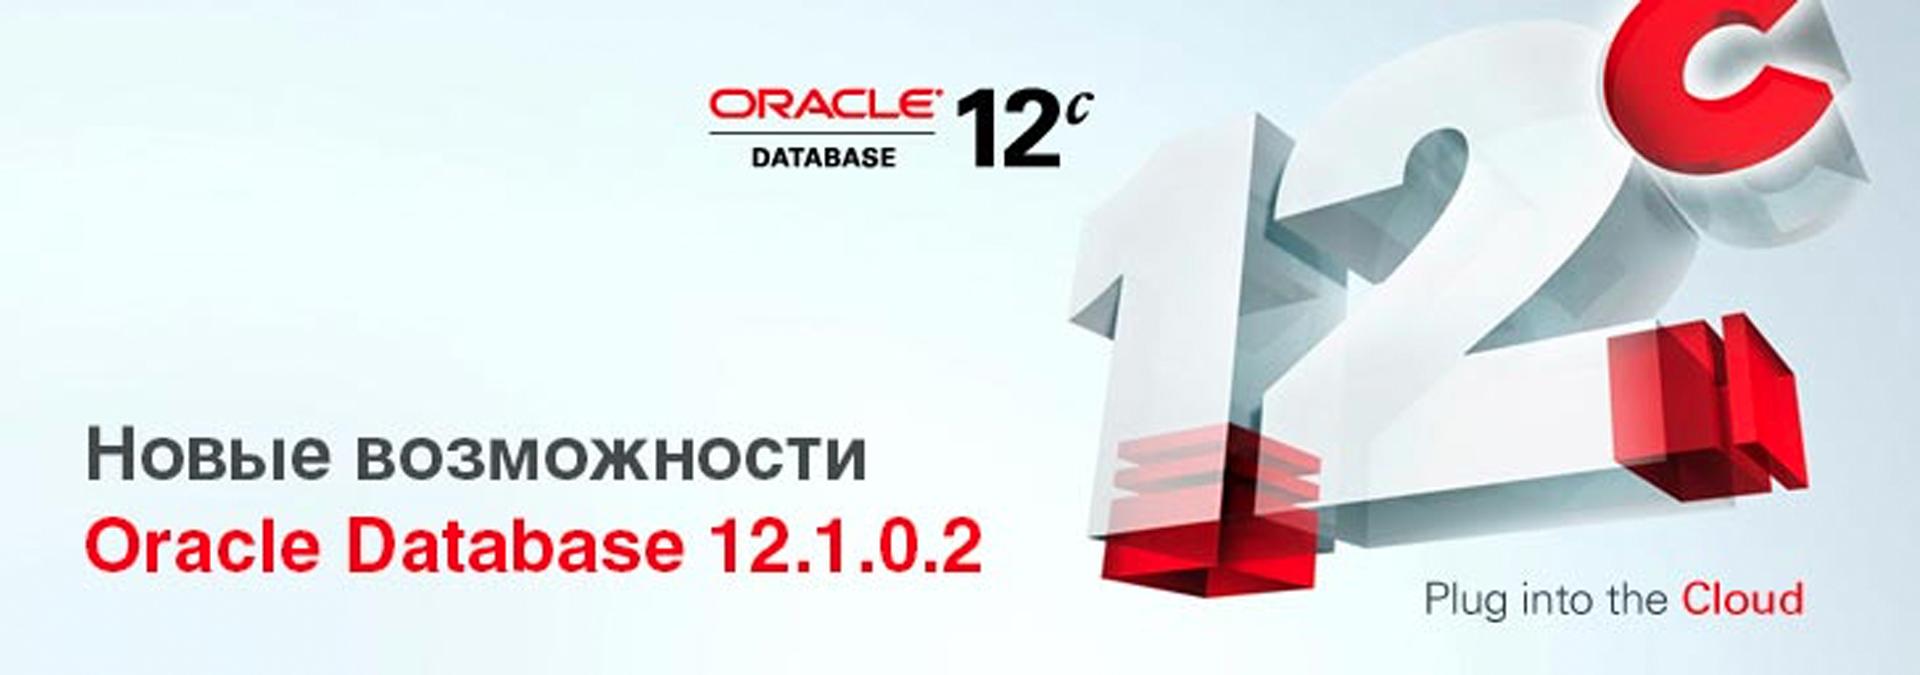 Регистрация на веб-семинар Oracle «Новые возможности Oracle Database 12.1.0 ...